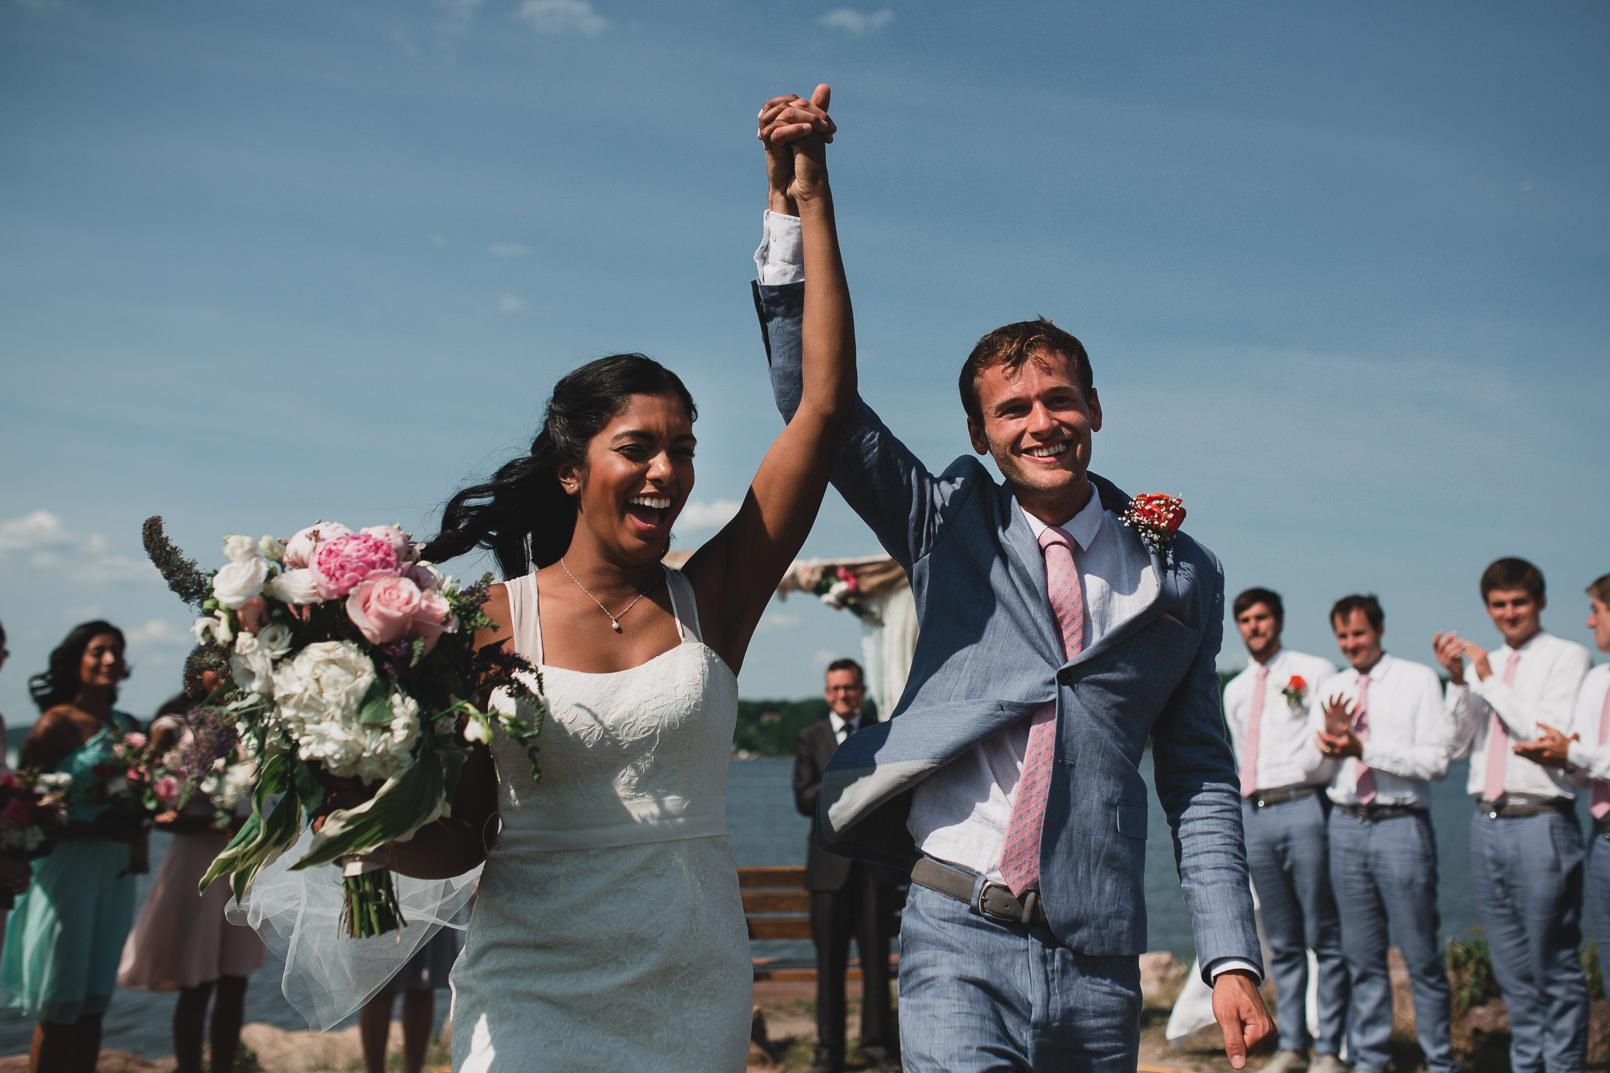 044-Jonathan-Kuhn-Photography-Wedding-_mini.jpg